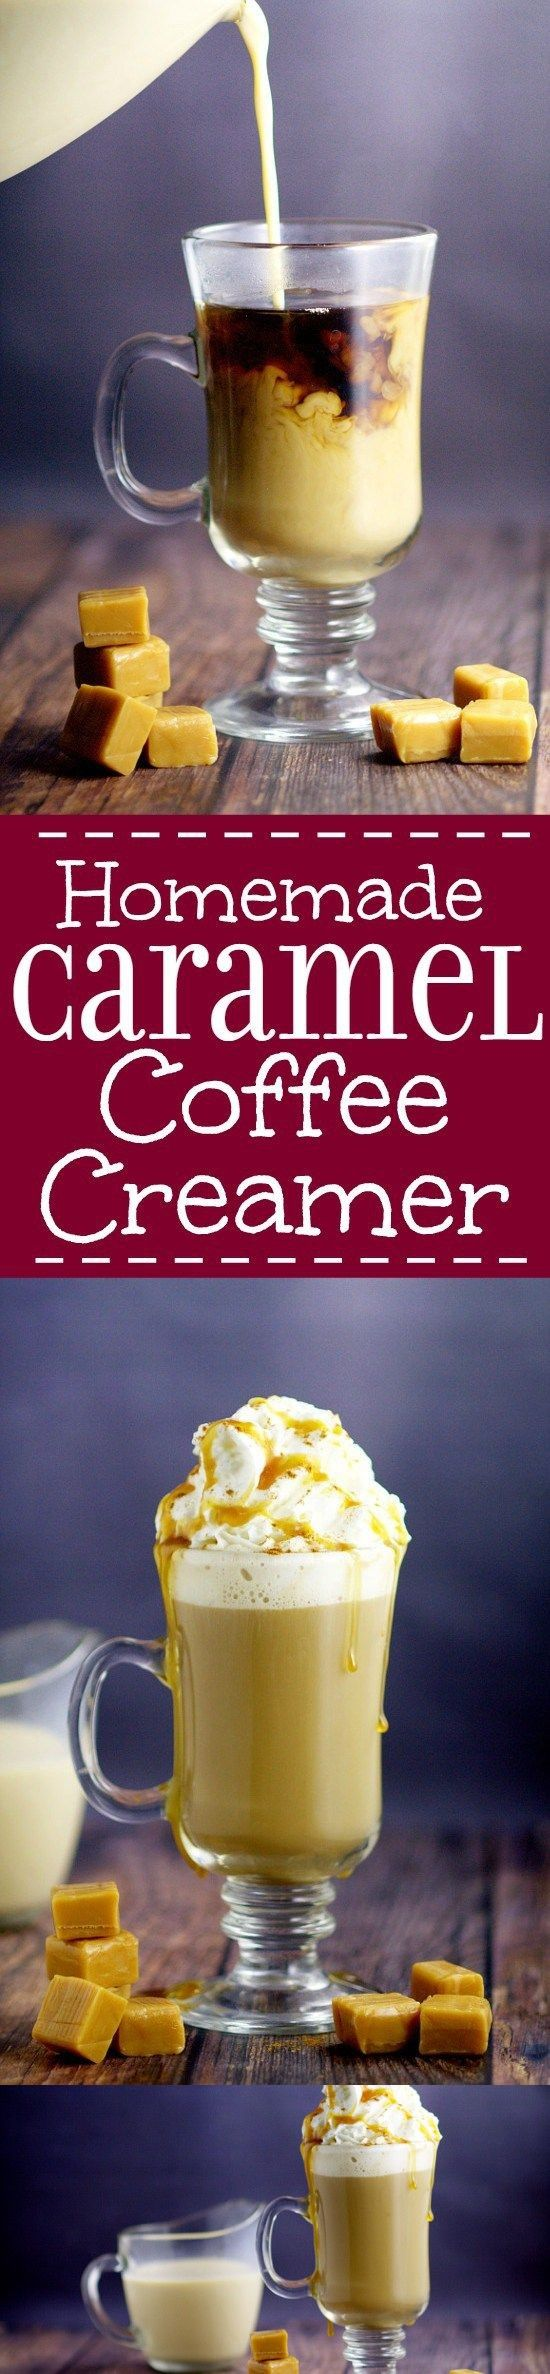 Homemade Caramel Coffee Creamer Recipe in 2020 Caramel